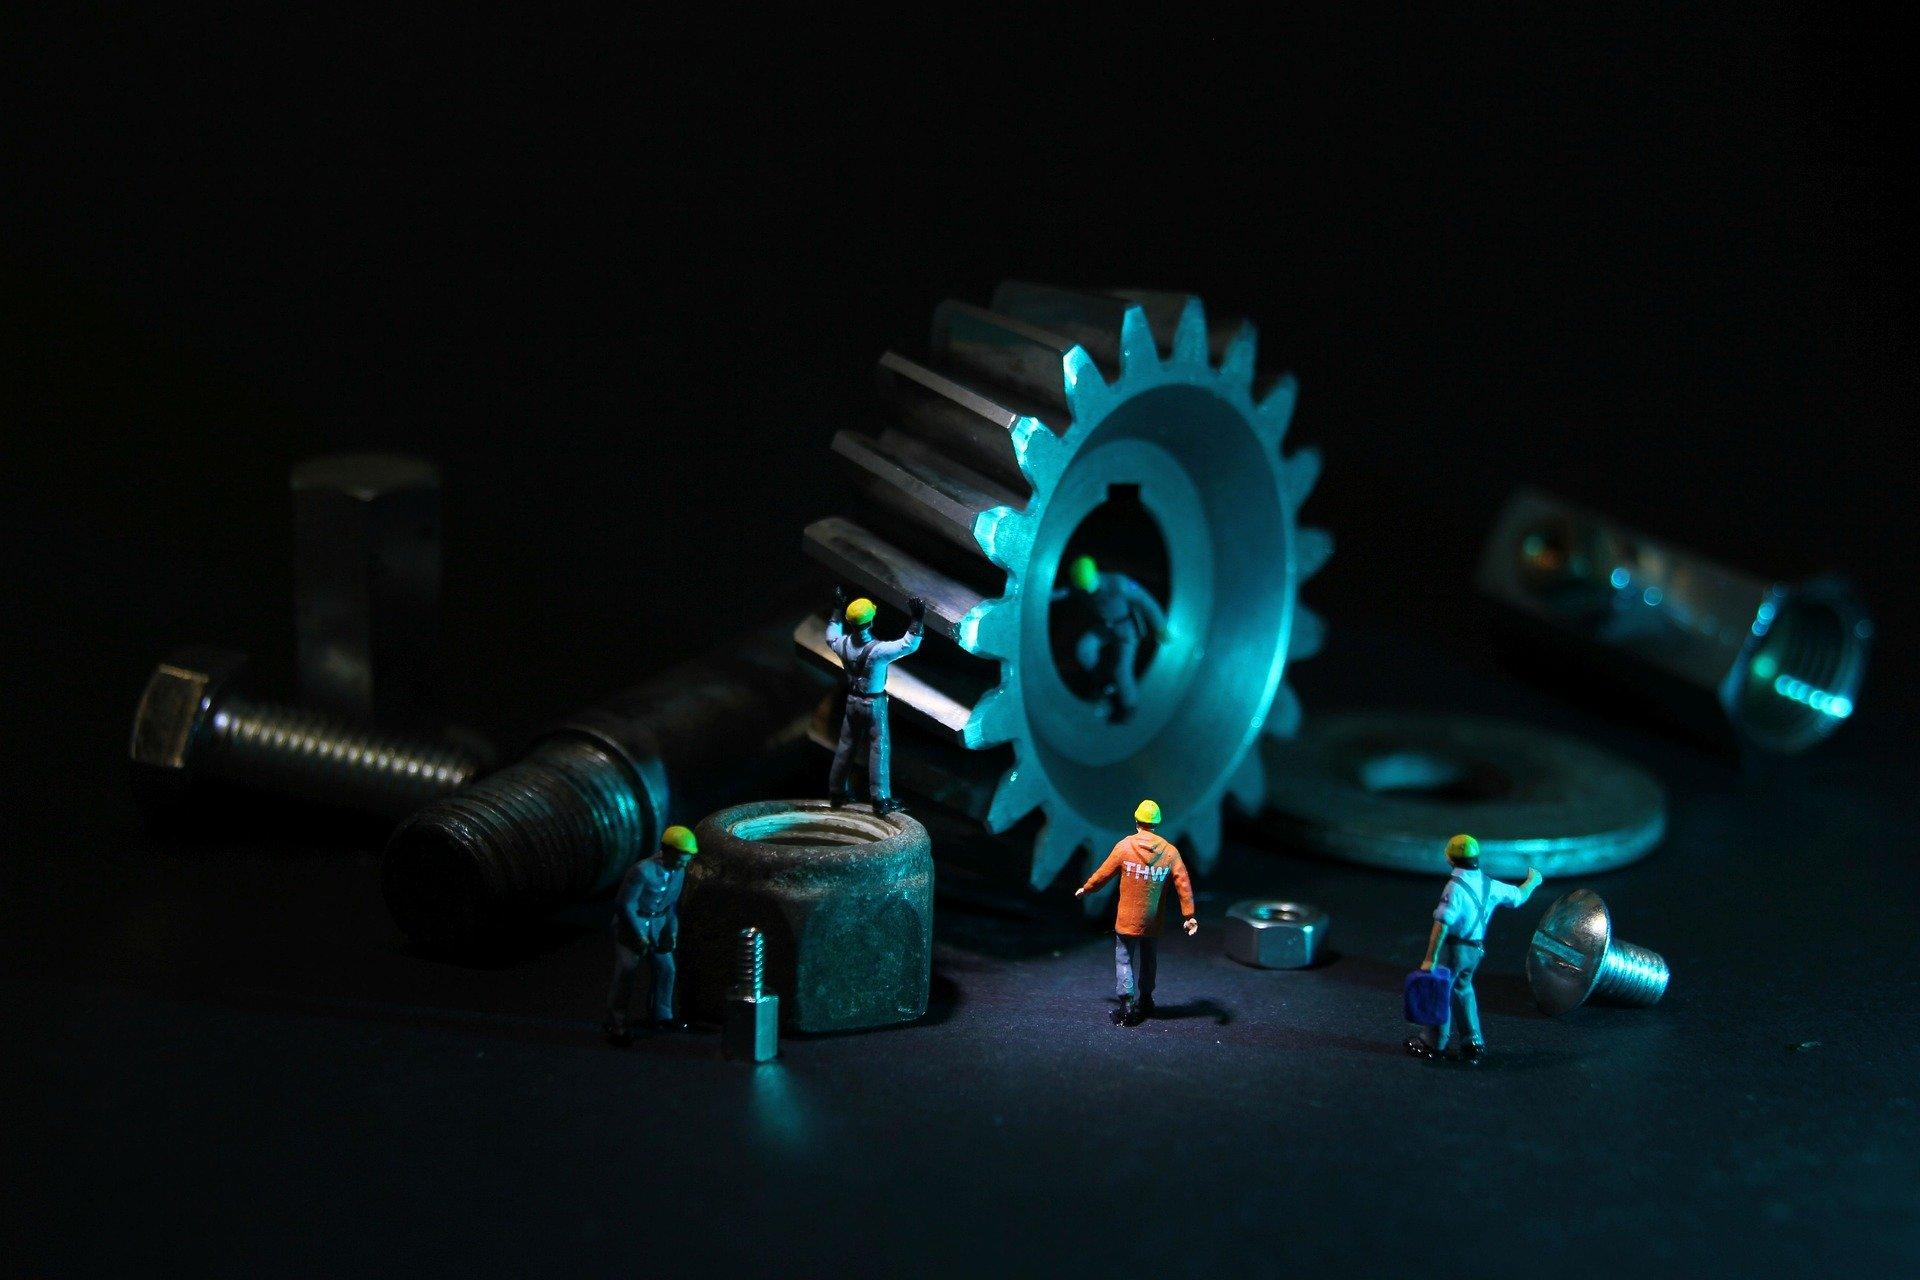 Kovovýroba efektivita práce